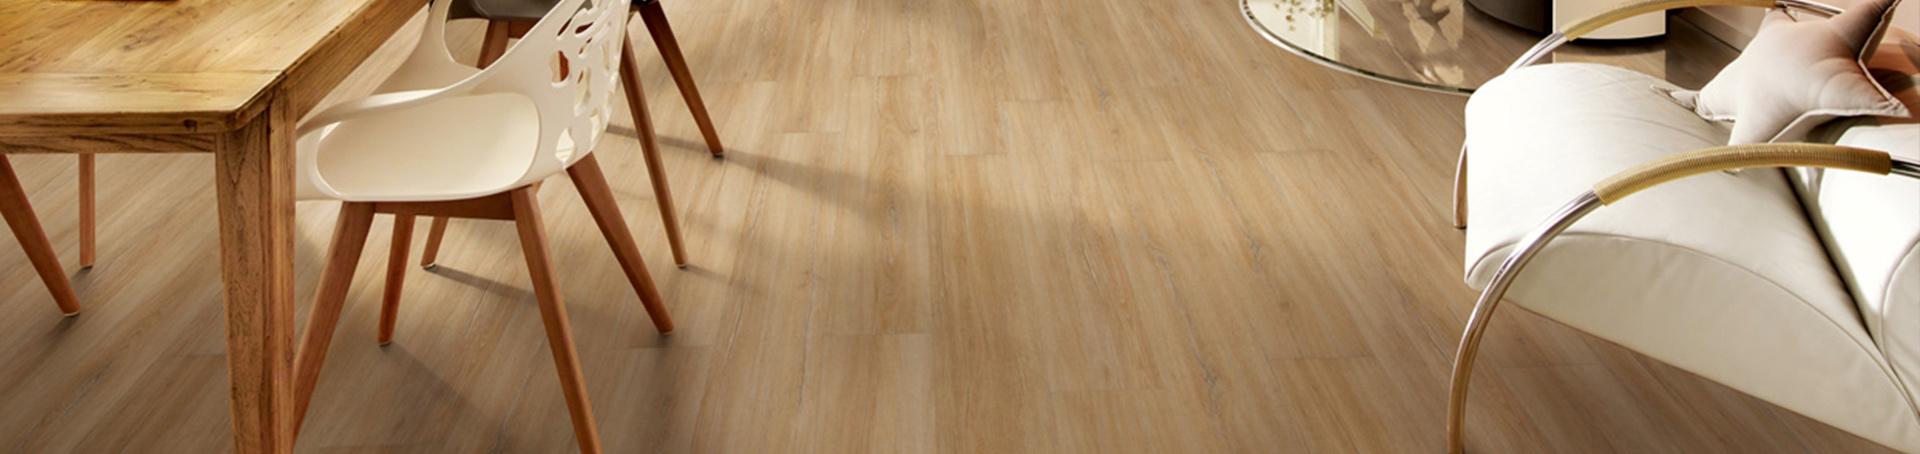 Fußbodentechnik Abanoz in Bad Oldesloe